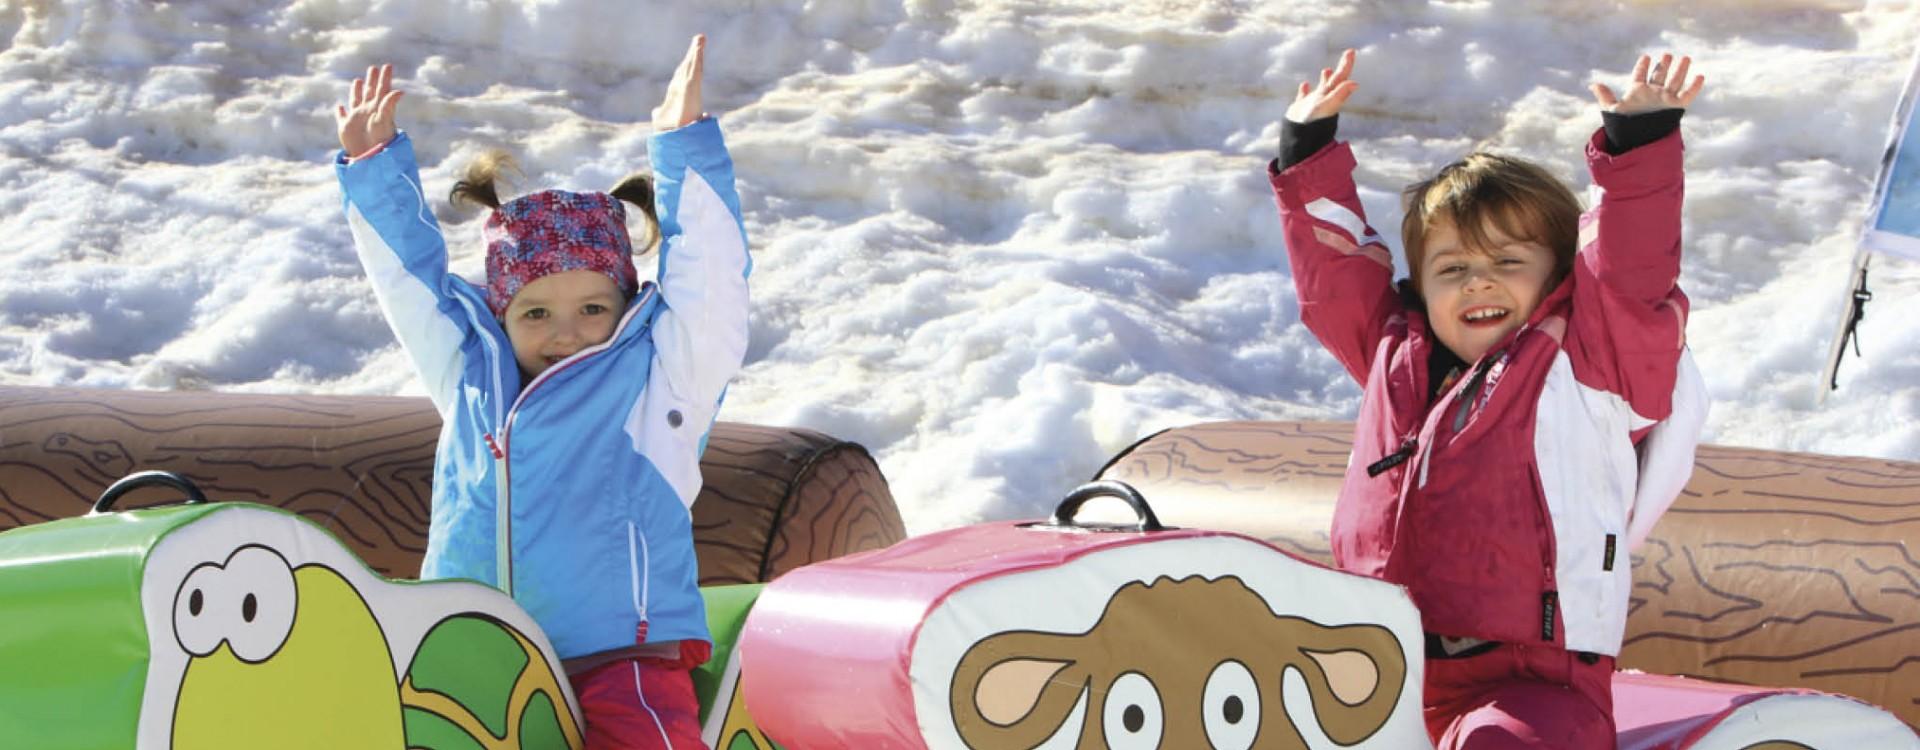 Pejo Kinderland e  Biancaneve snowpark